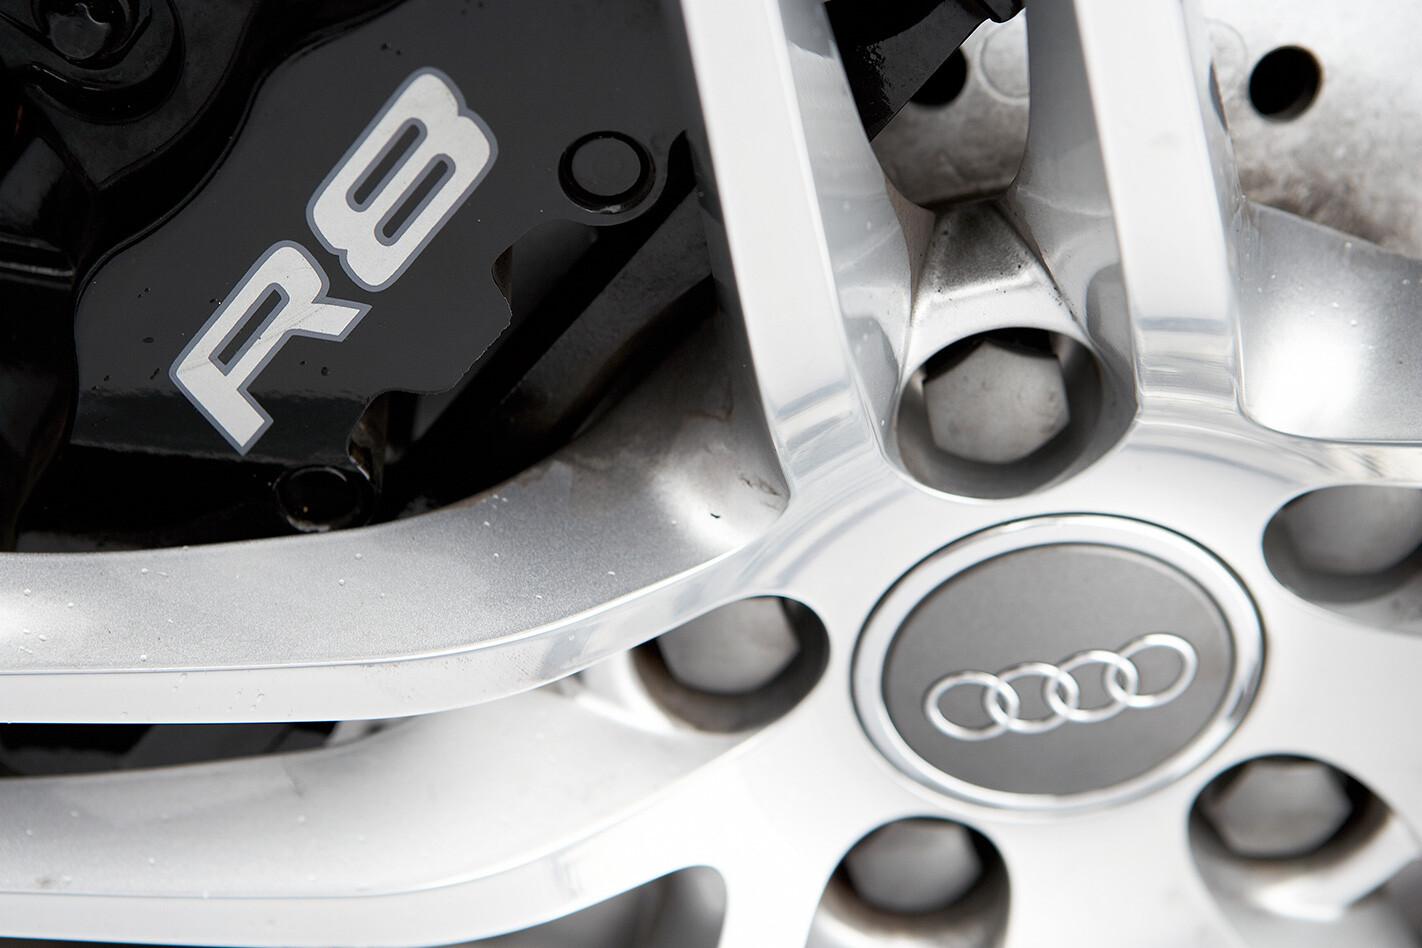 2008 Audi R8 wheel